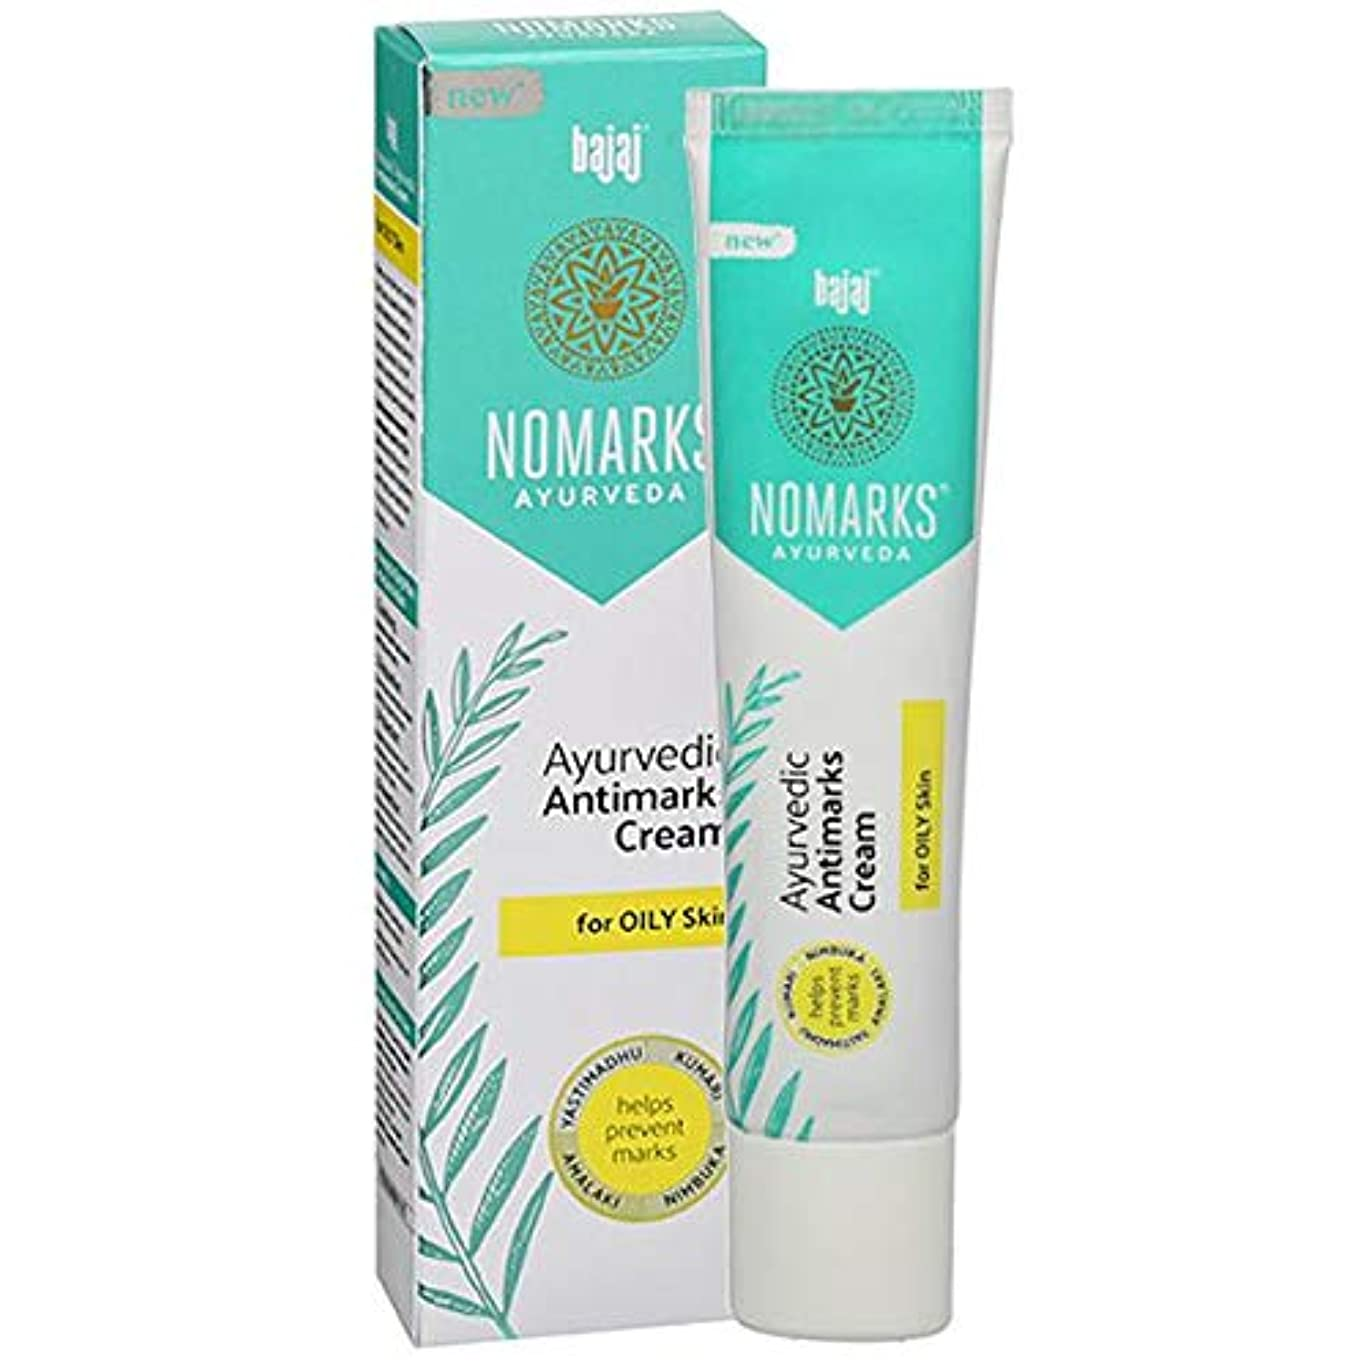 Bajaj Nomarks For oily Skin For Pimple - Mark Free Glowing Fairness with Emblica Aloe & Lemonエンブリカアロエ&レモンマーク無料...